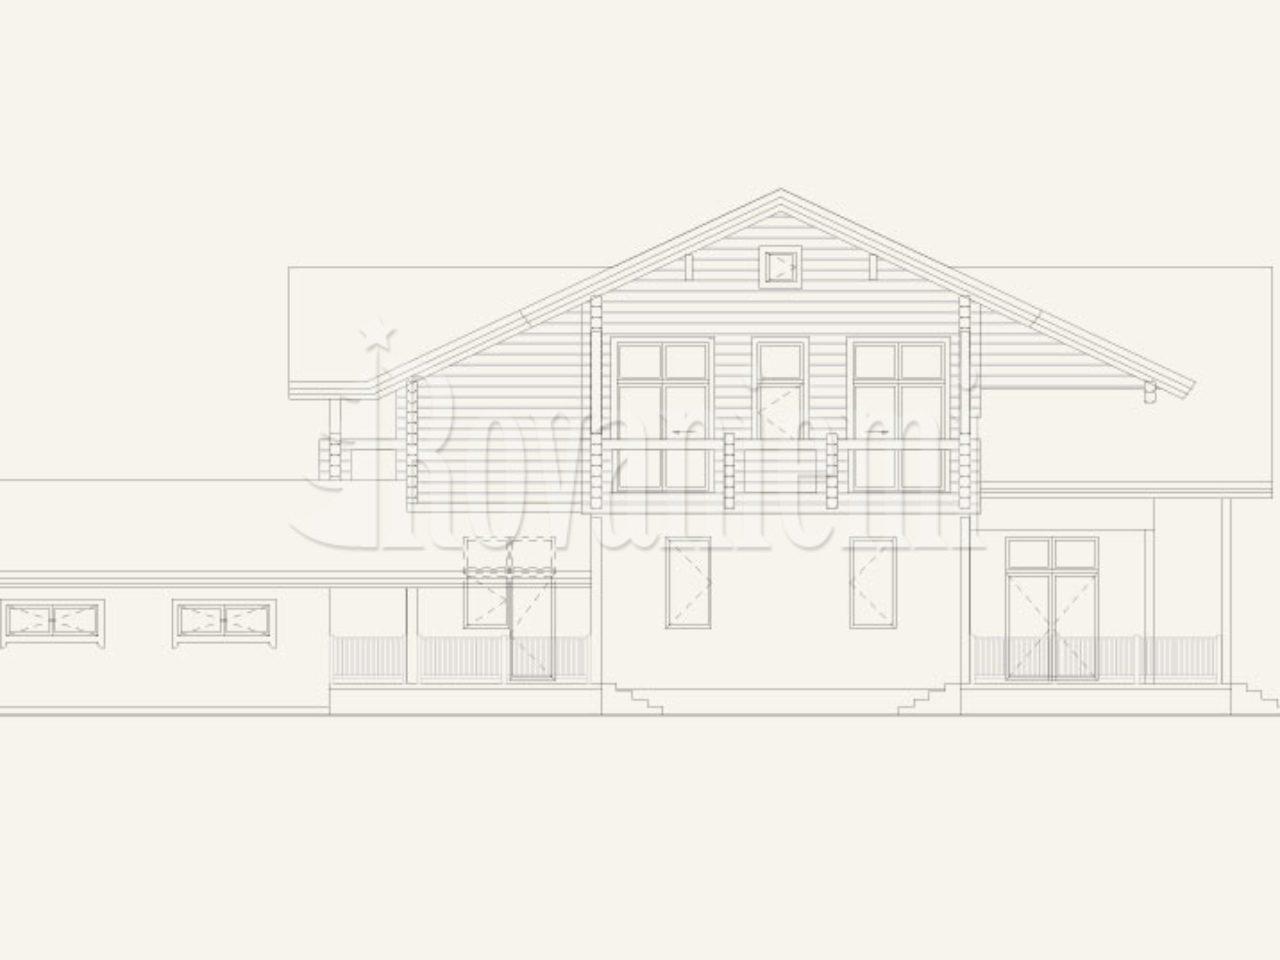 Fasad-2-Solnechnyj